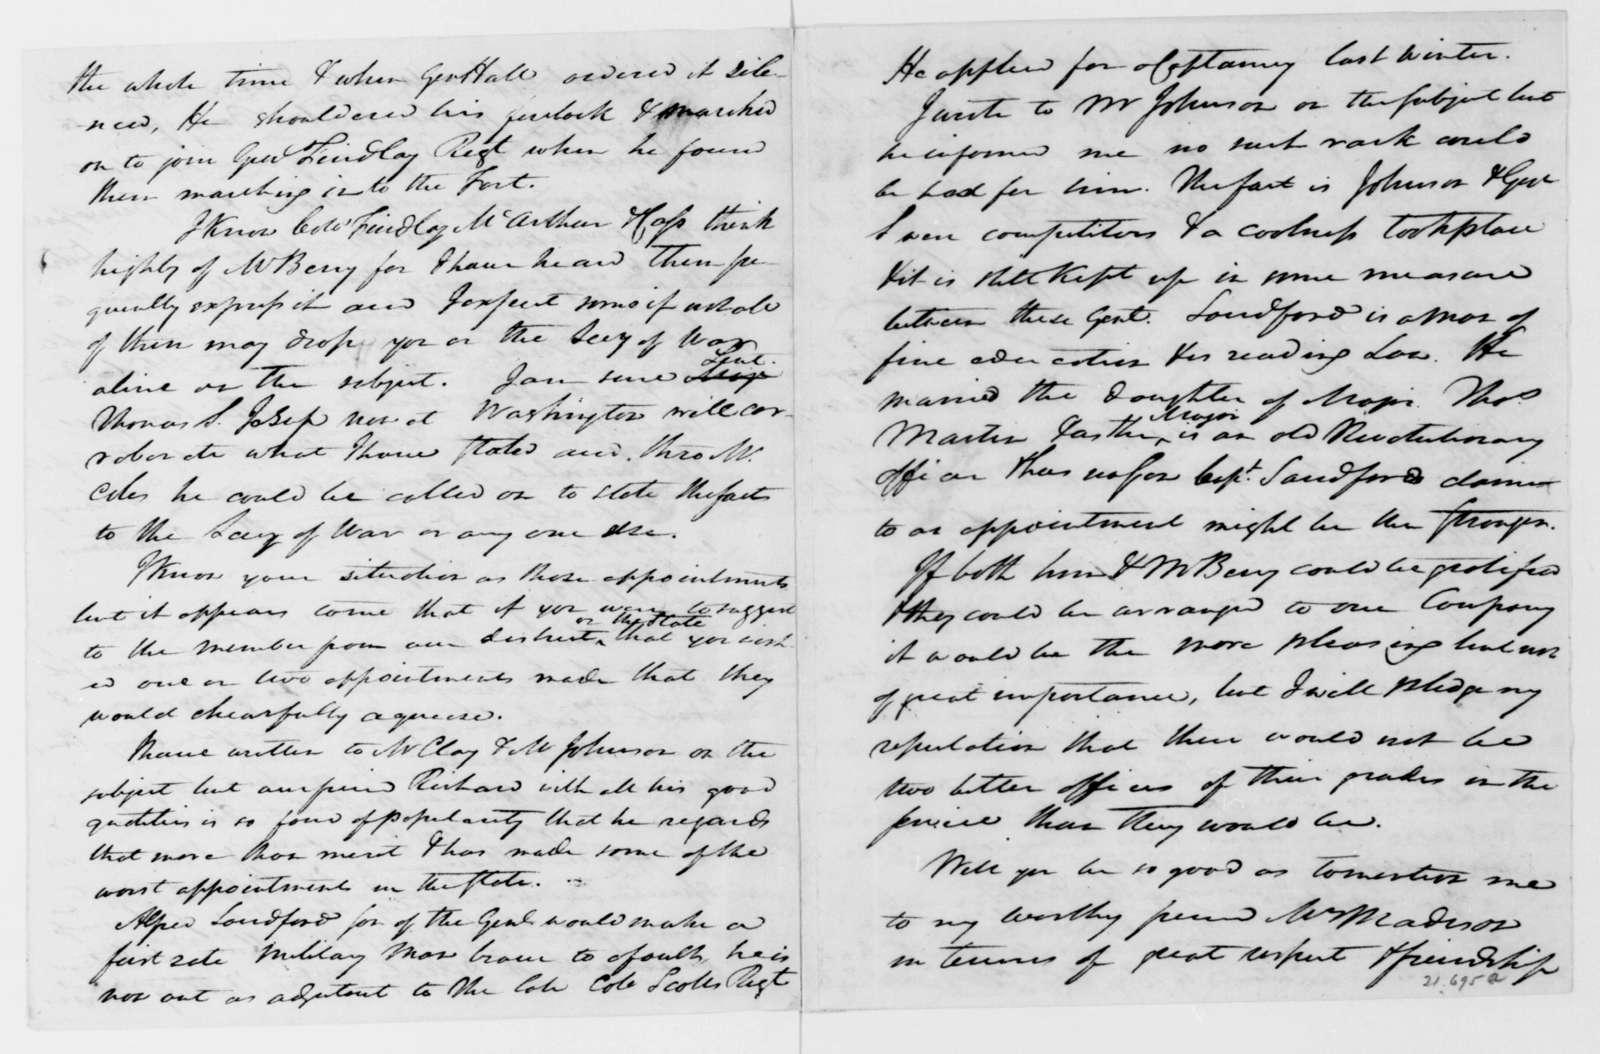 James Taylor to James Madison, January 31, 1813.